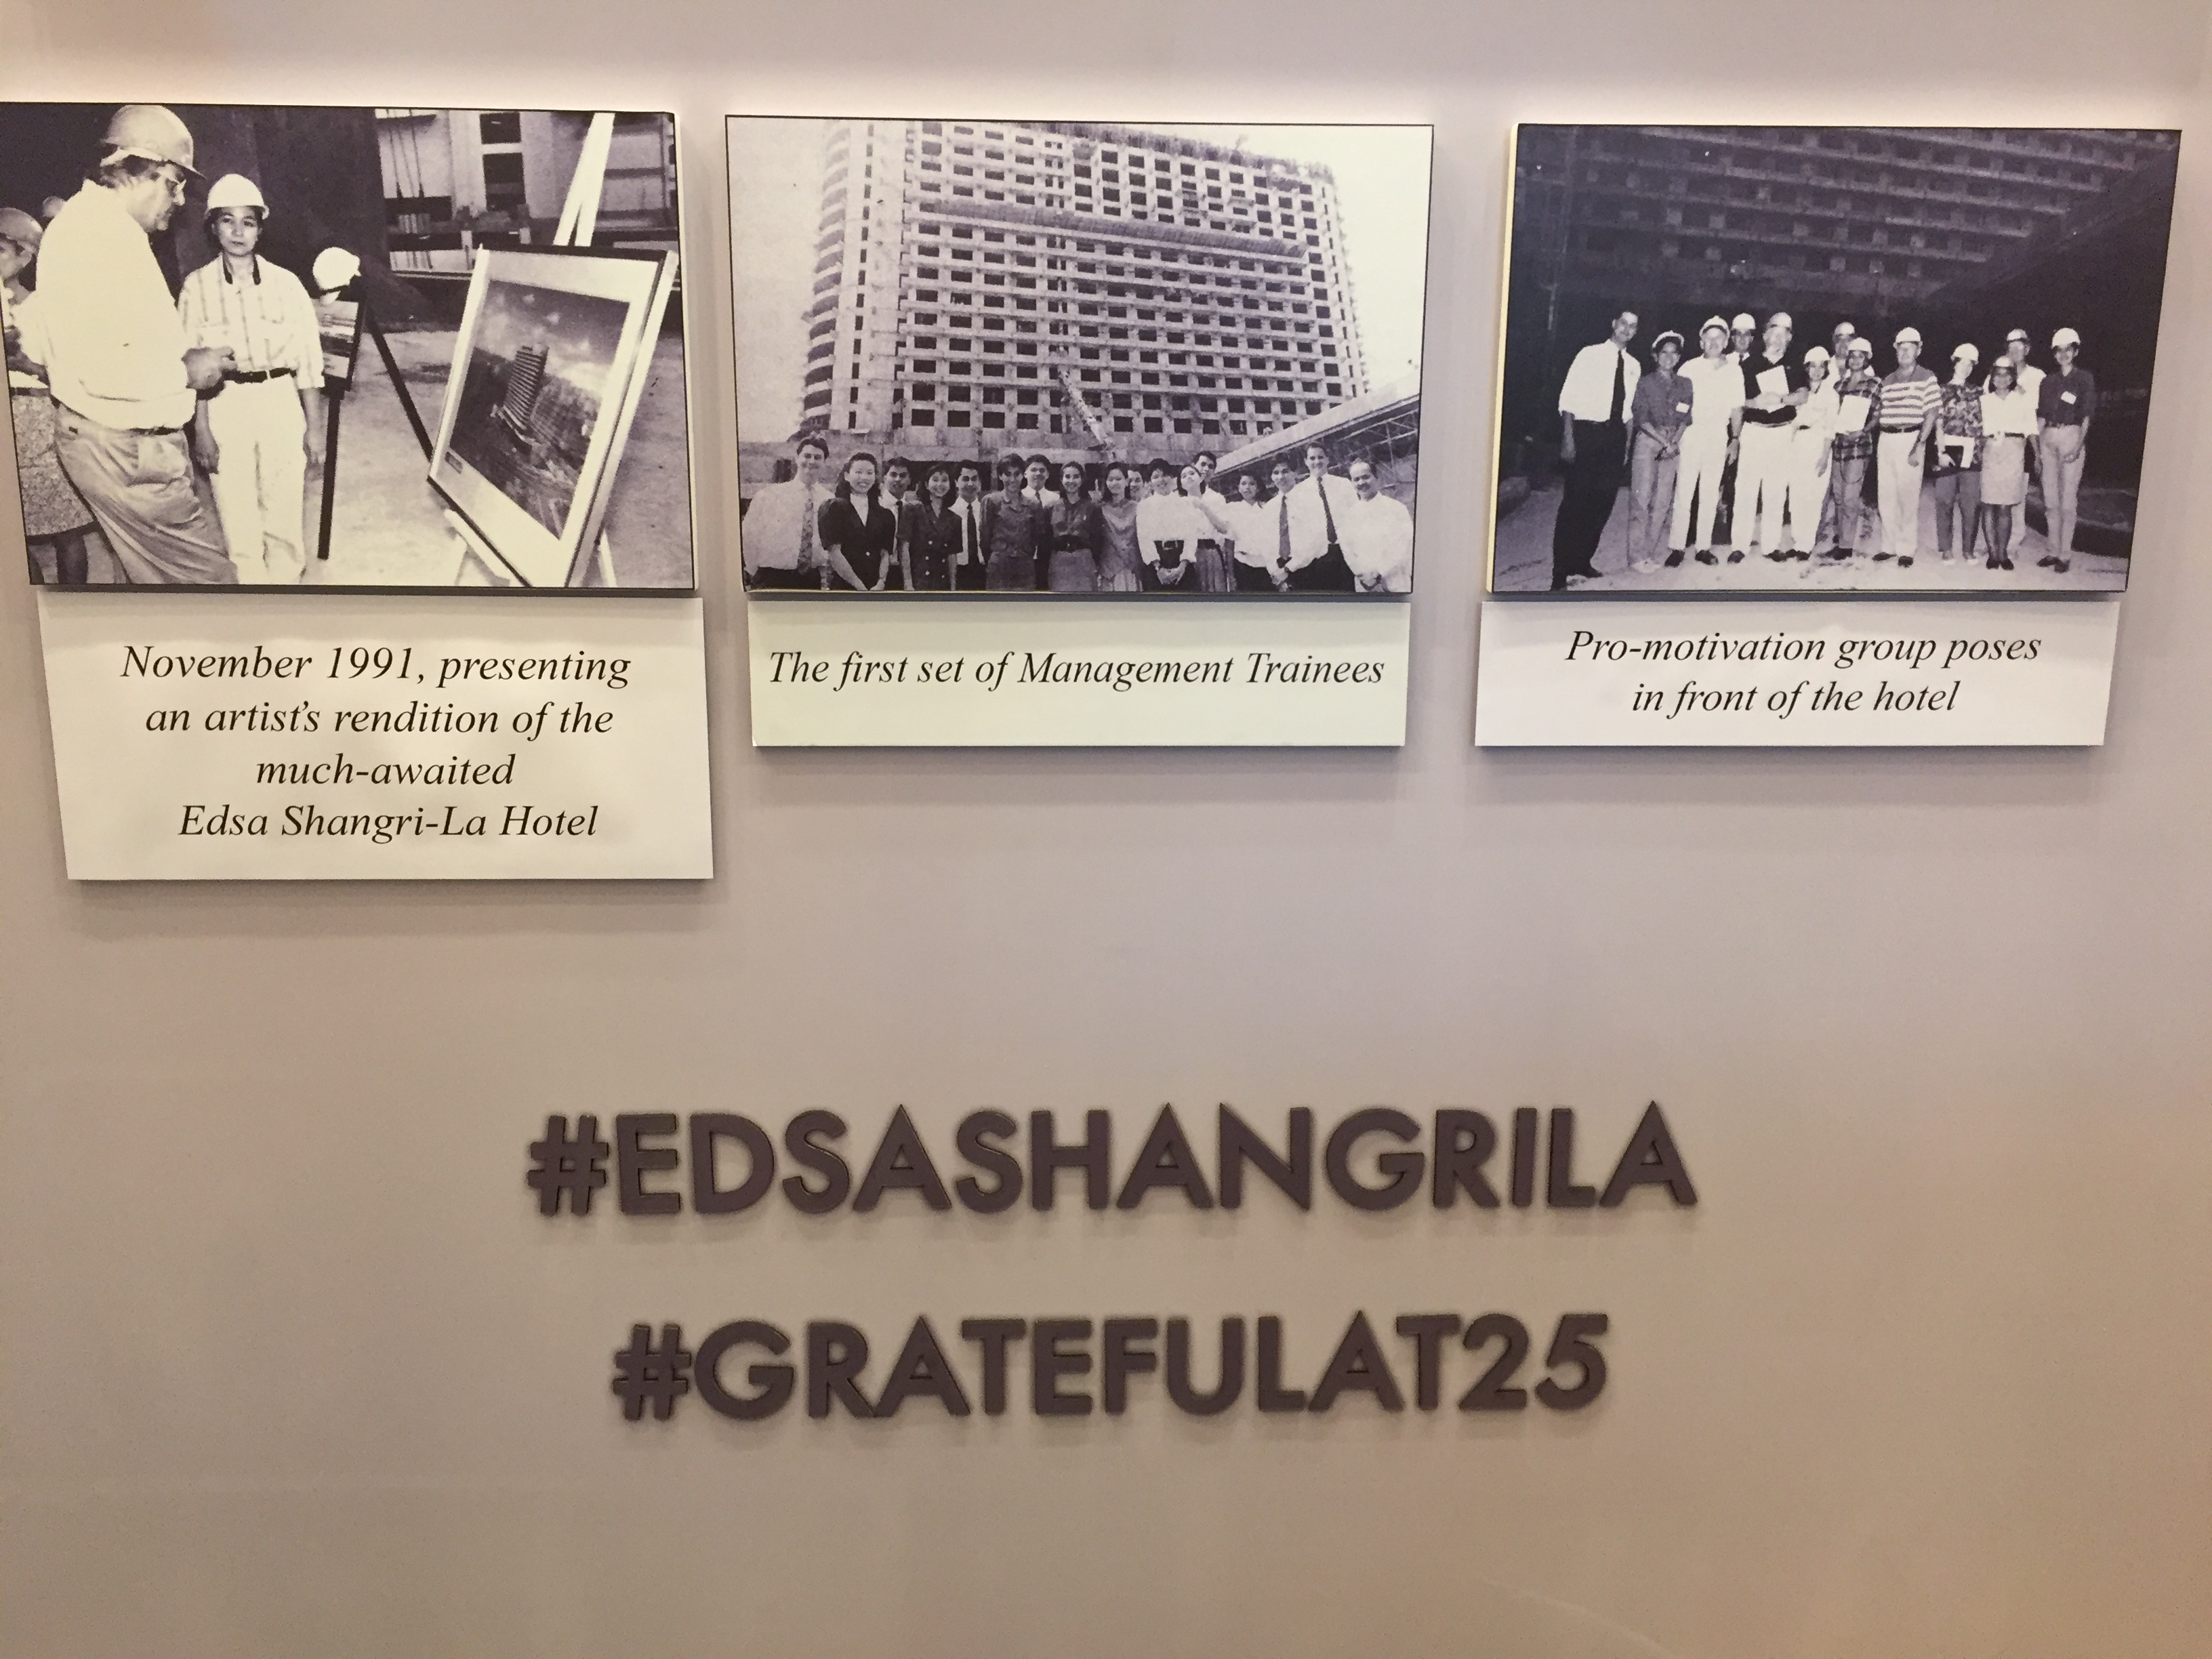 EDSA Shangri-La Hotel